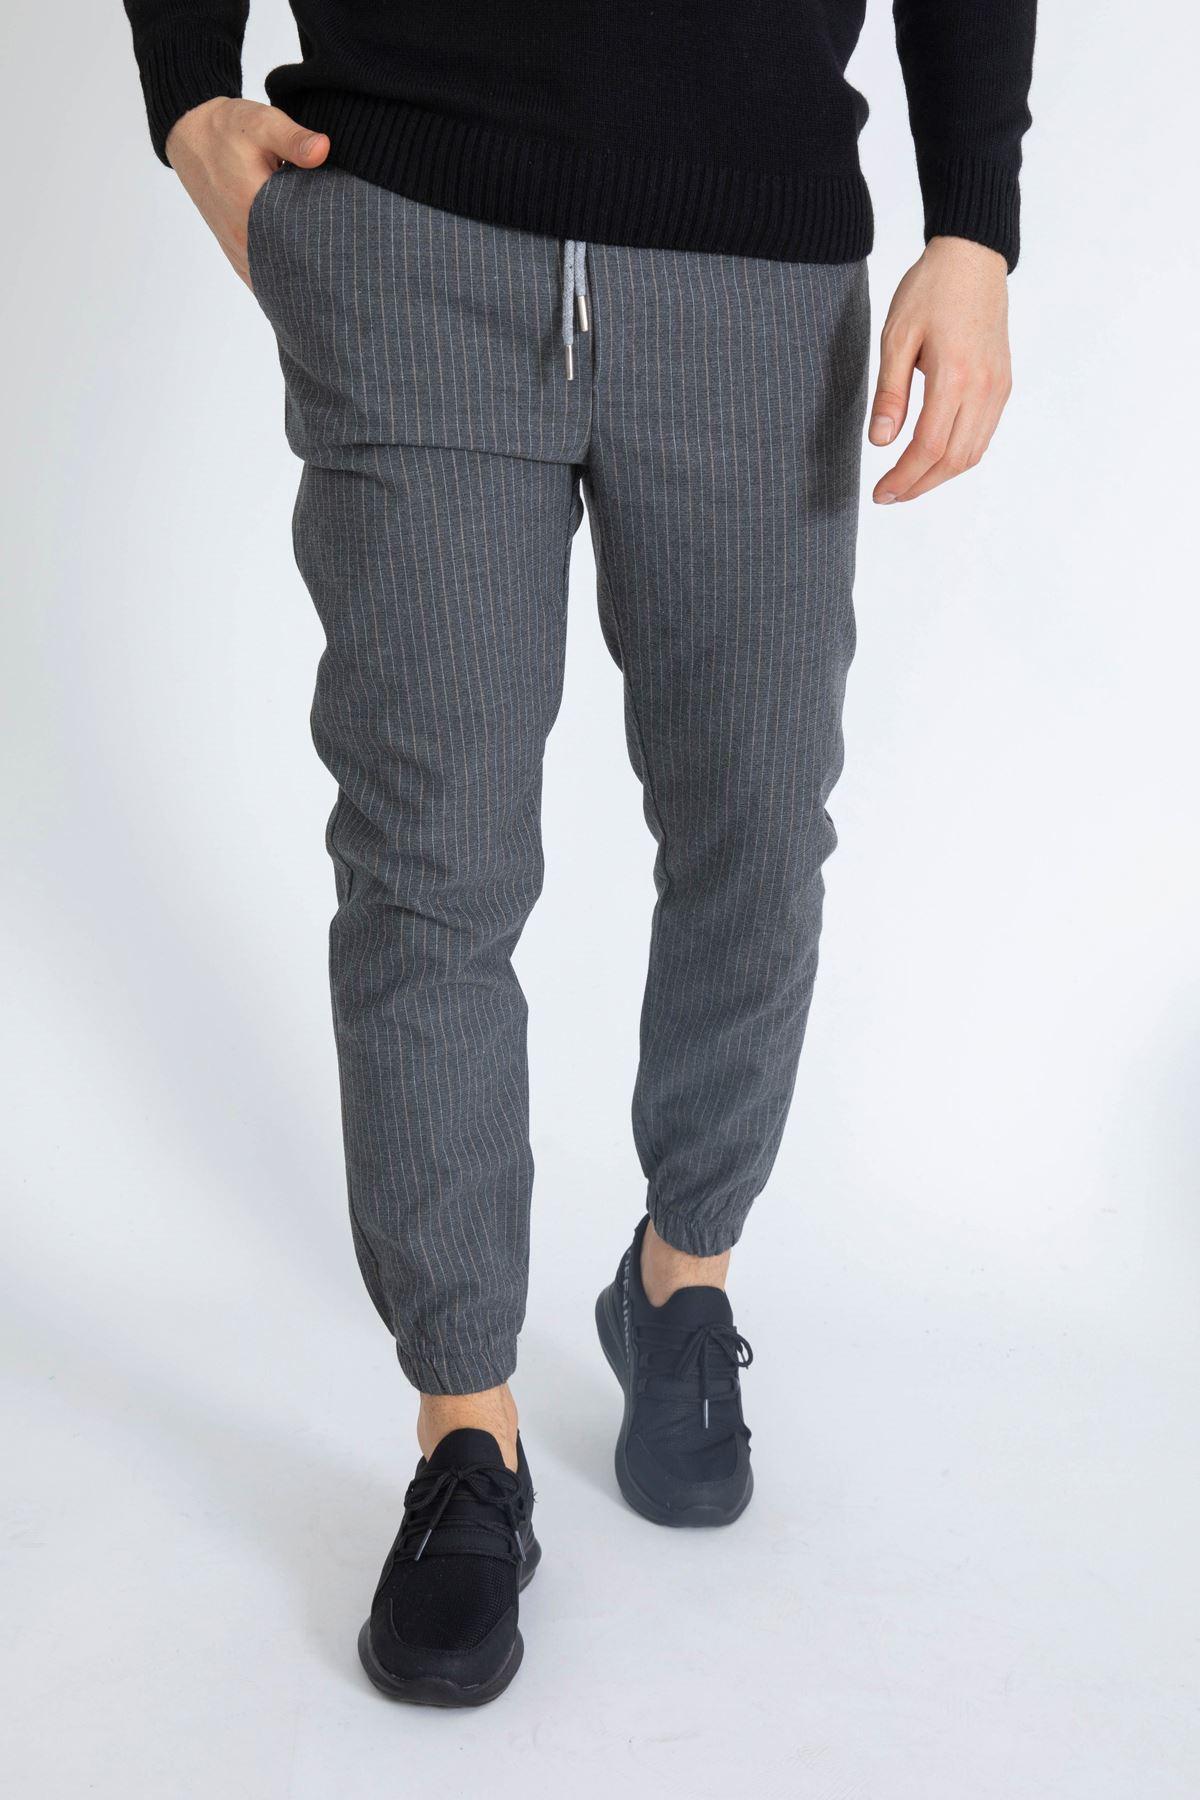 Erkek Beli Lastikli Çizgili Füme Jogger Pantolon